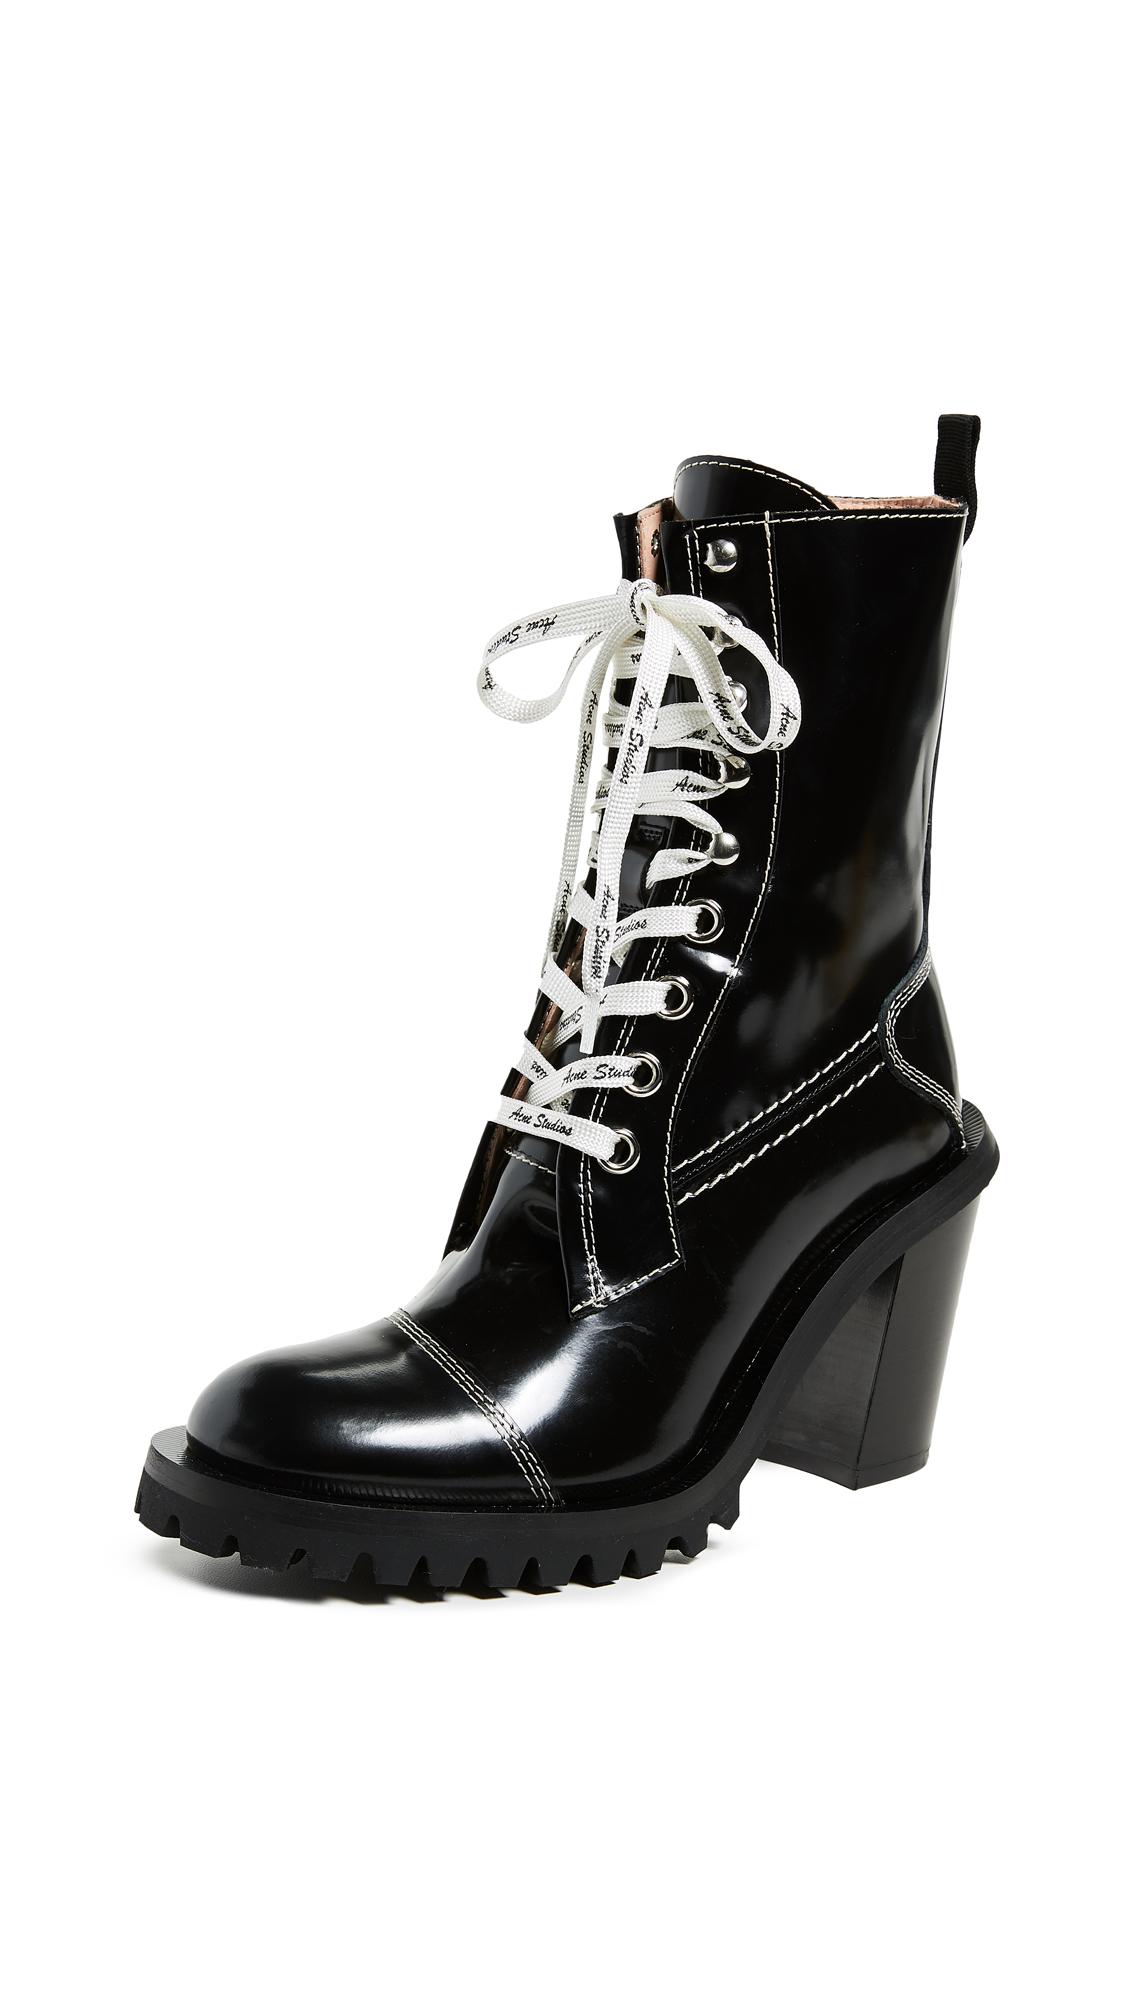 Acne Studios Heeled Combat Boots - Black